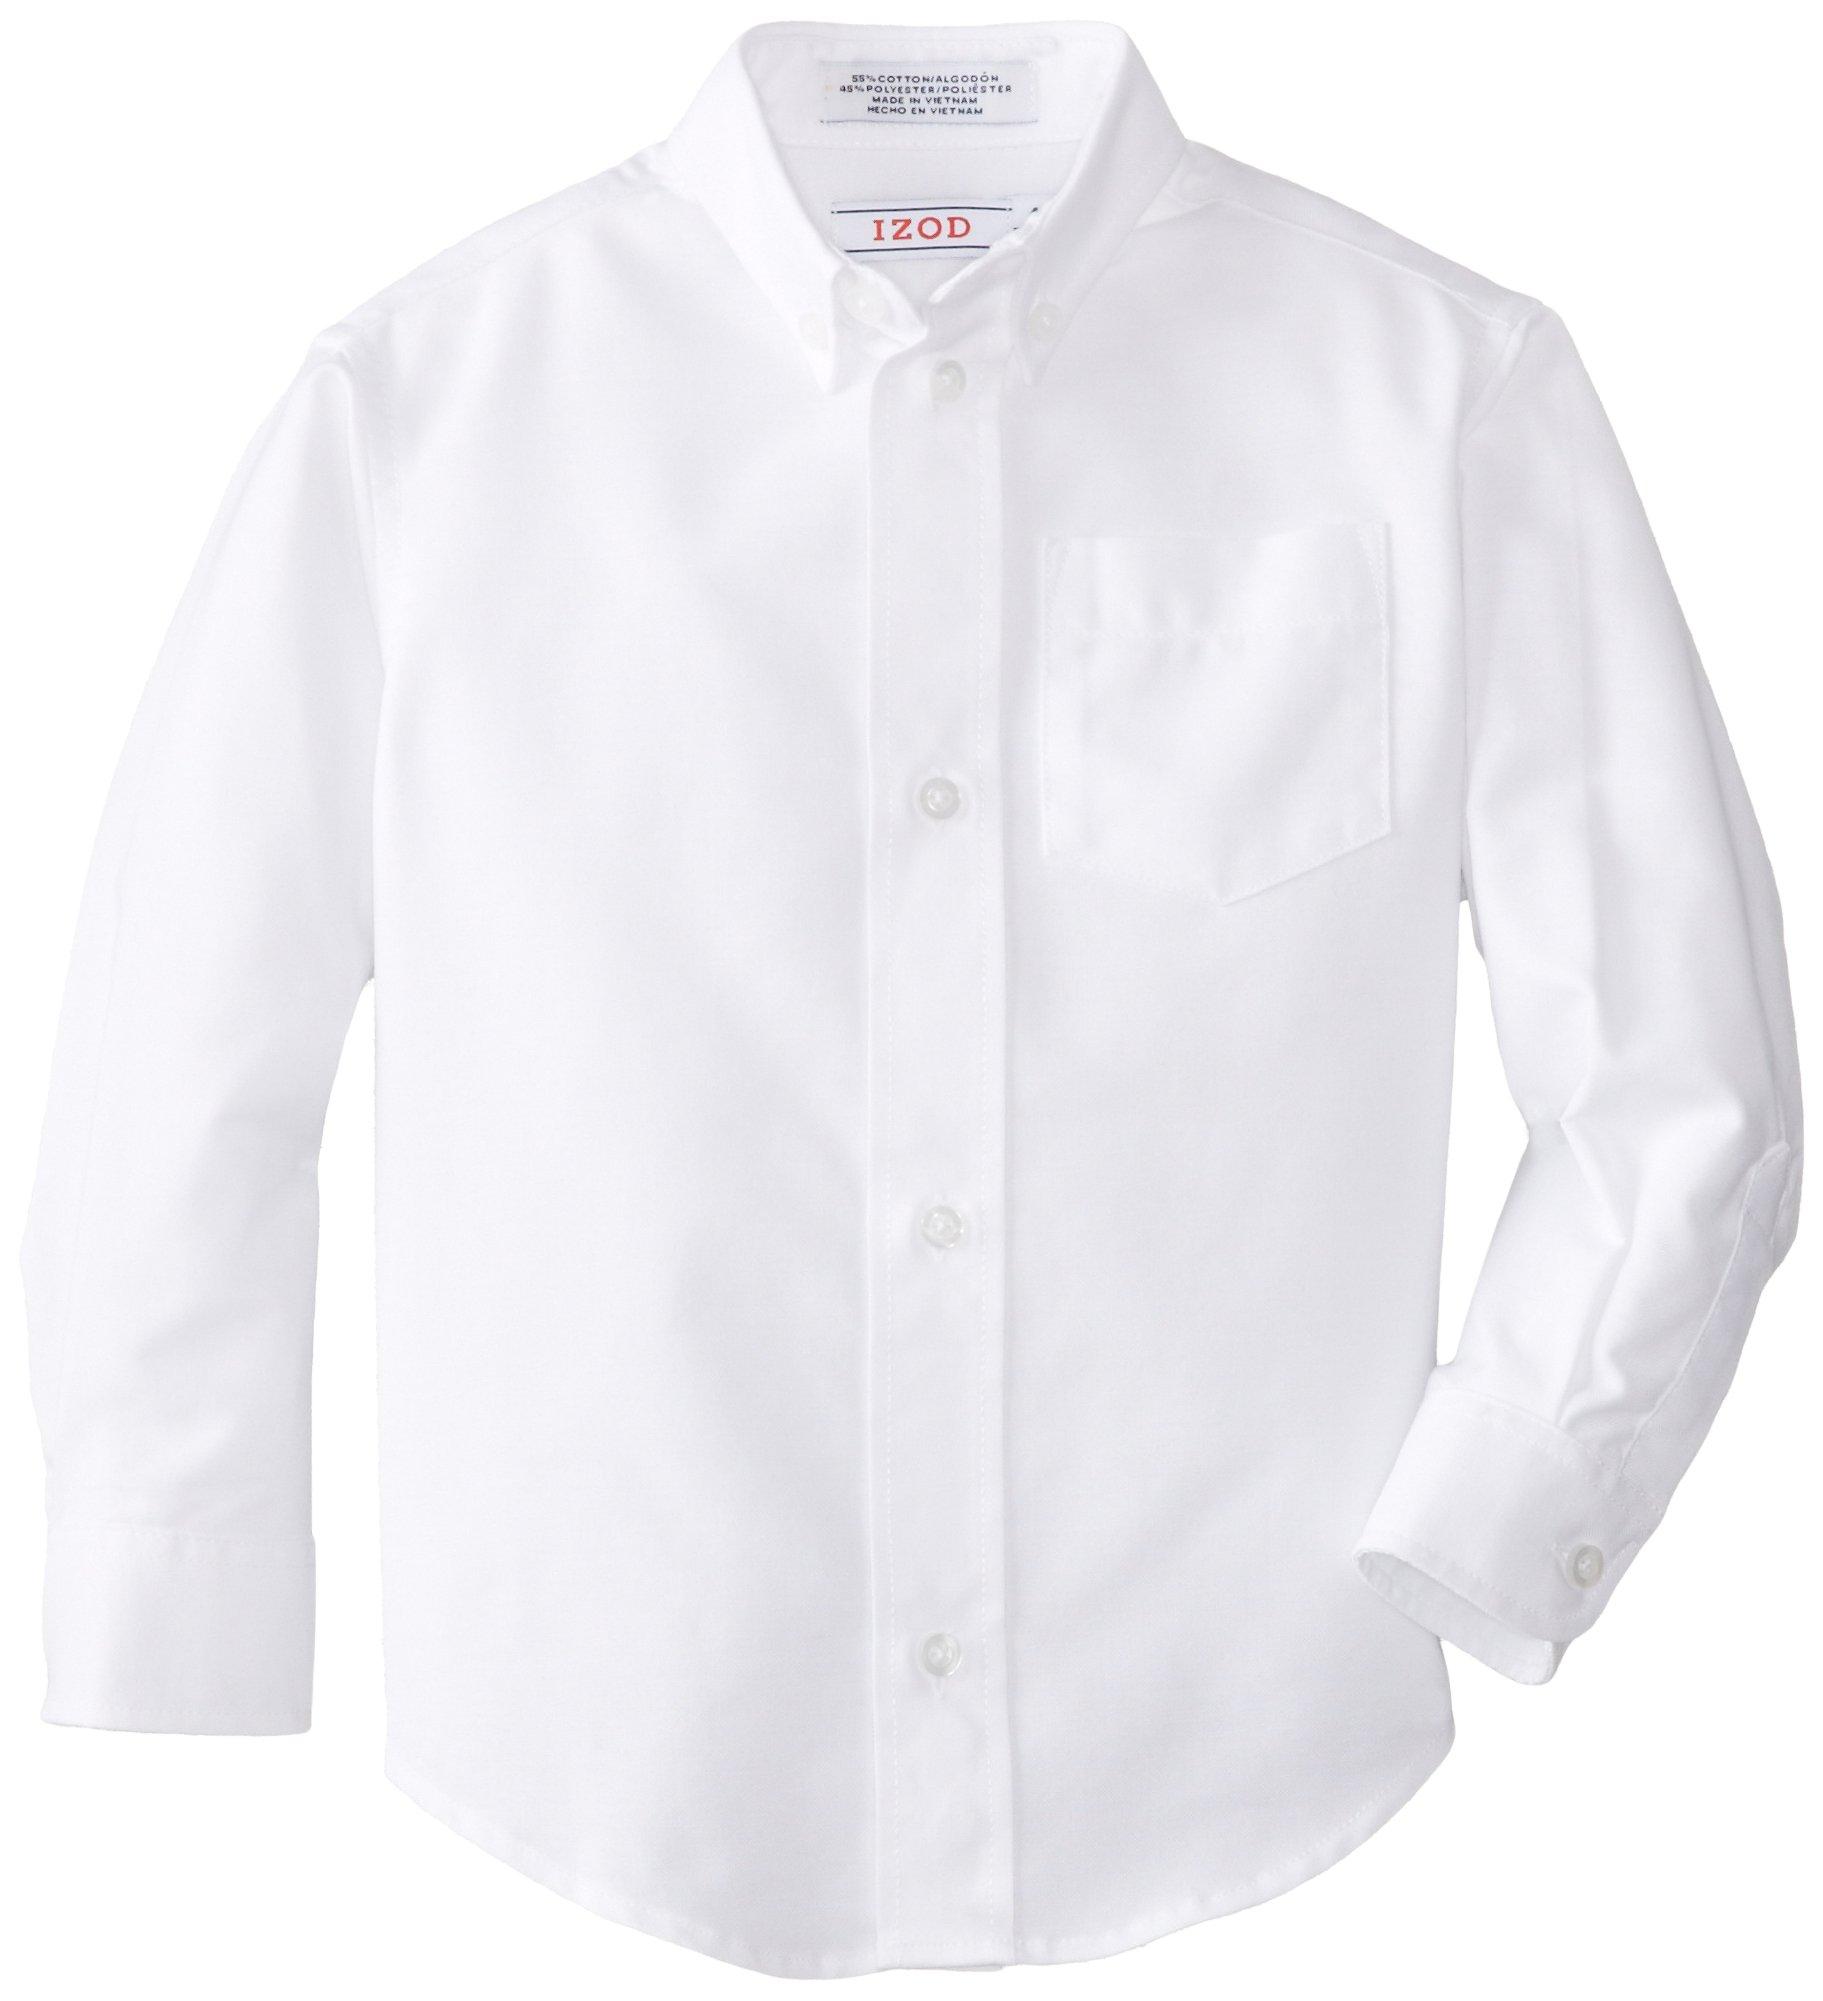 IZOD Little Boys' Oxford Shirt,White,5